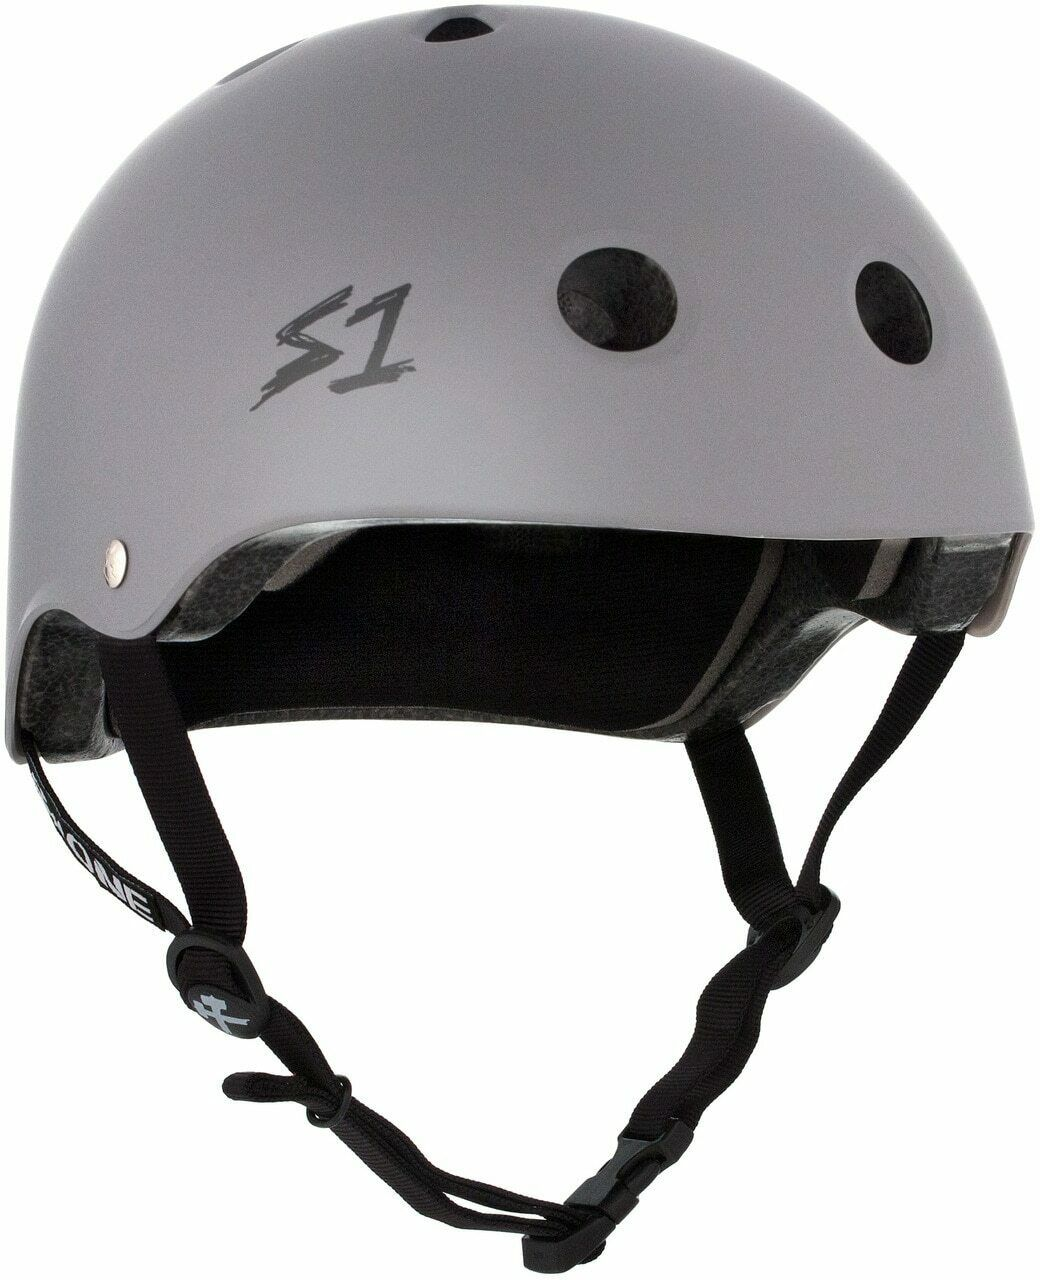 S1 Lifer  Helmet - Grey Matte  cheap designer brands